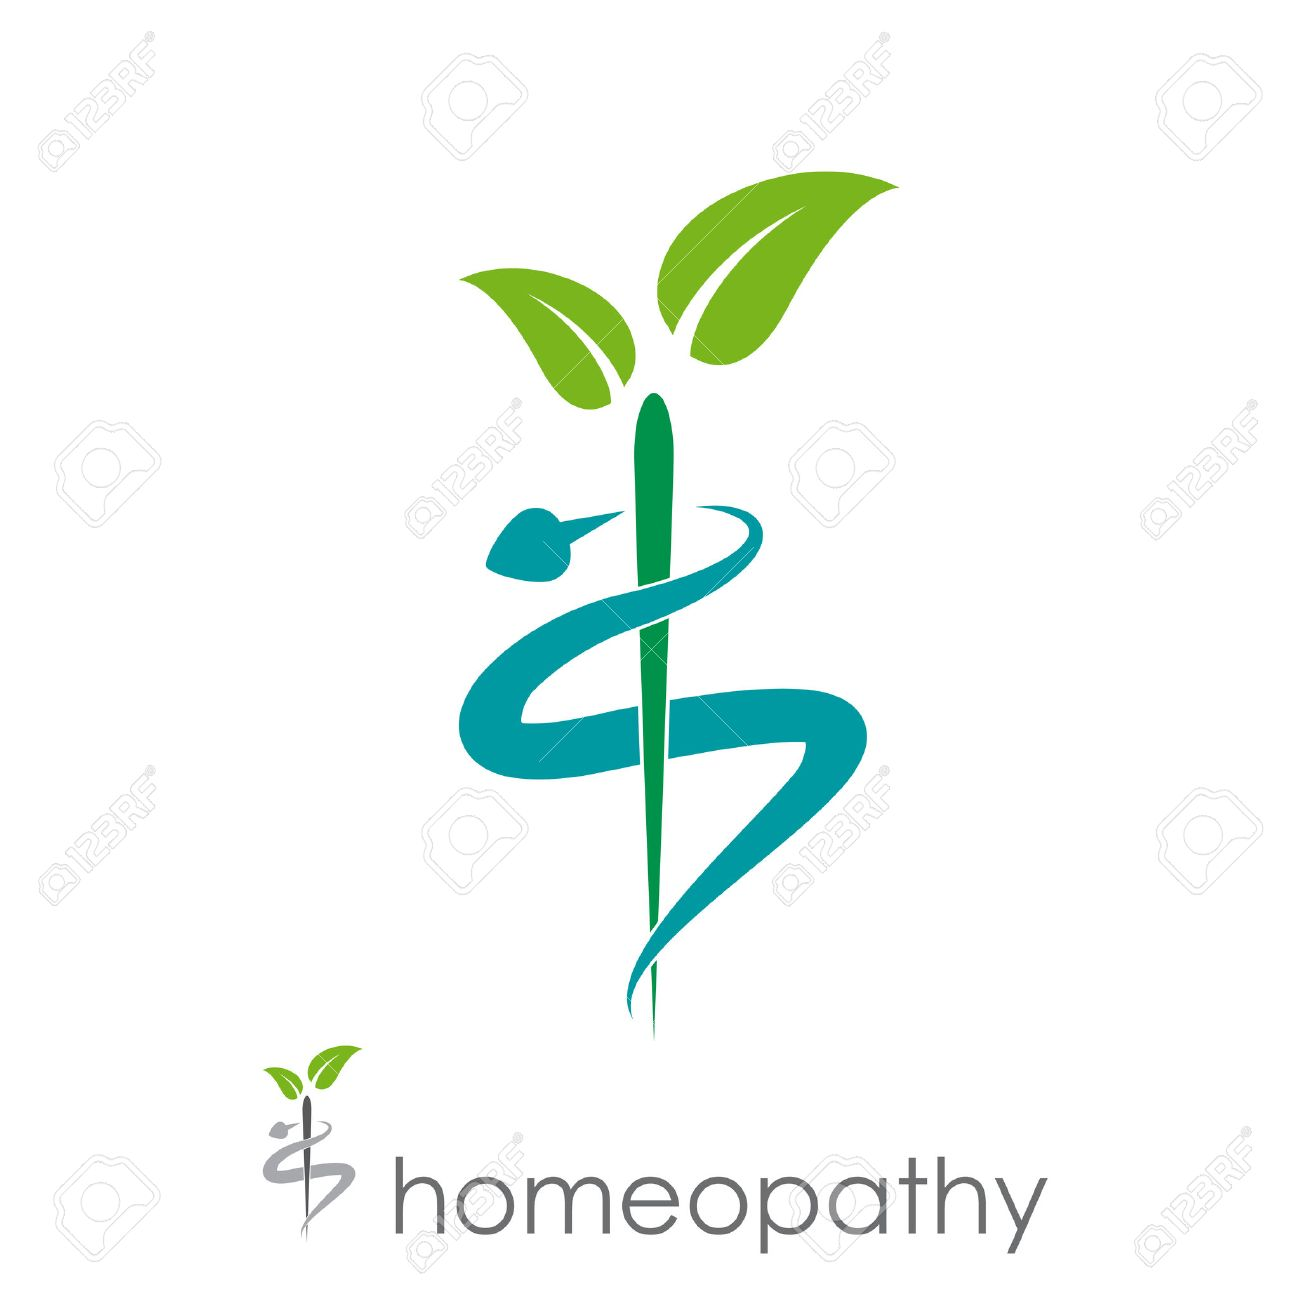 Vector sign homeopathy, alternative medicine - 51858962